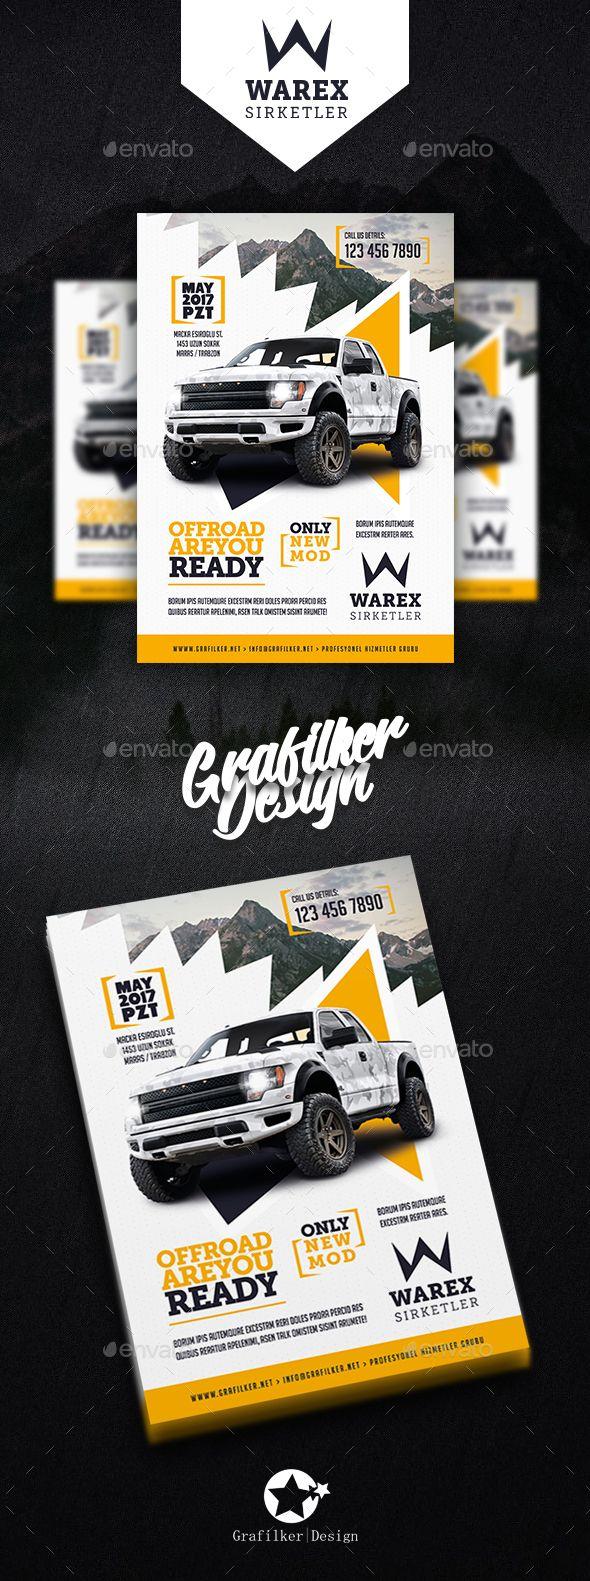 Car Sales Flyer Templates - Corporate #Flyers Download here: https://graphicriver.net/item/car-sales-flyer-templates/20156589?ref=alena994